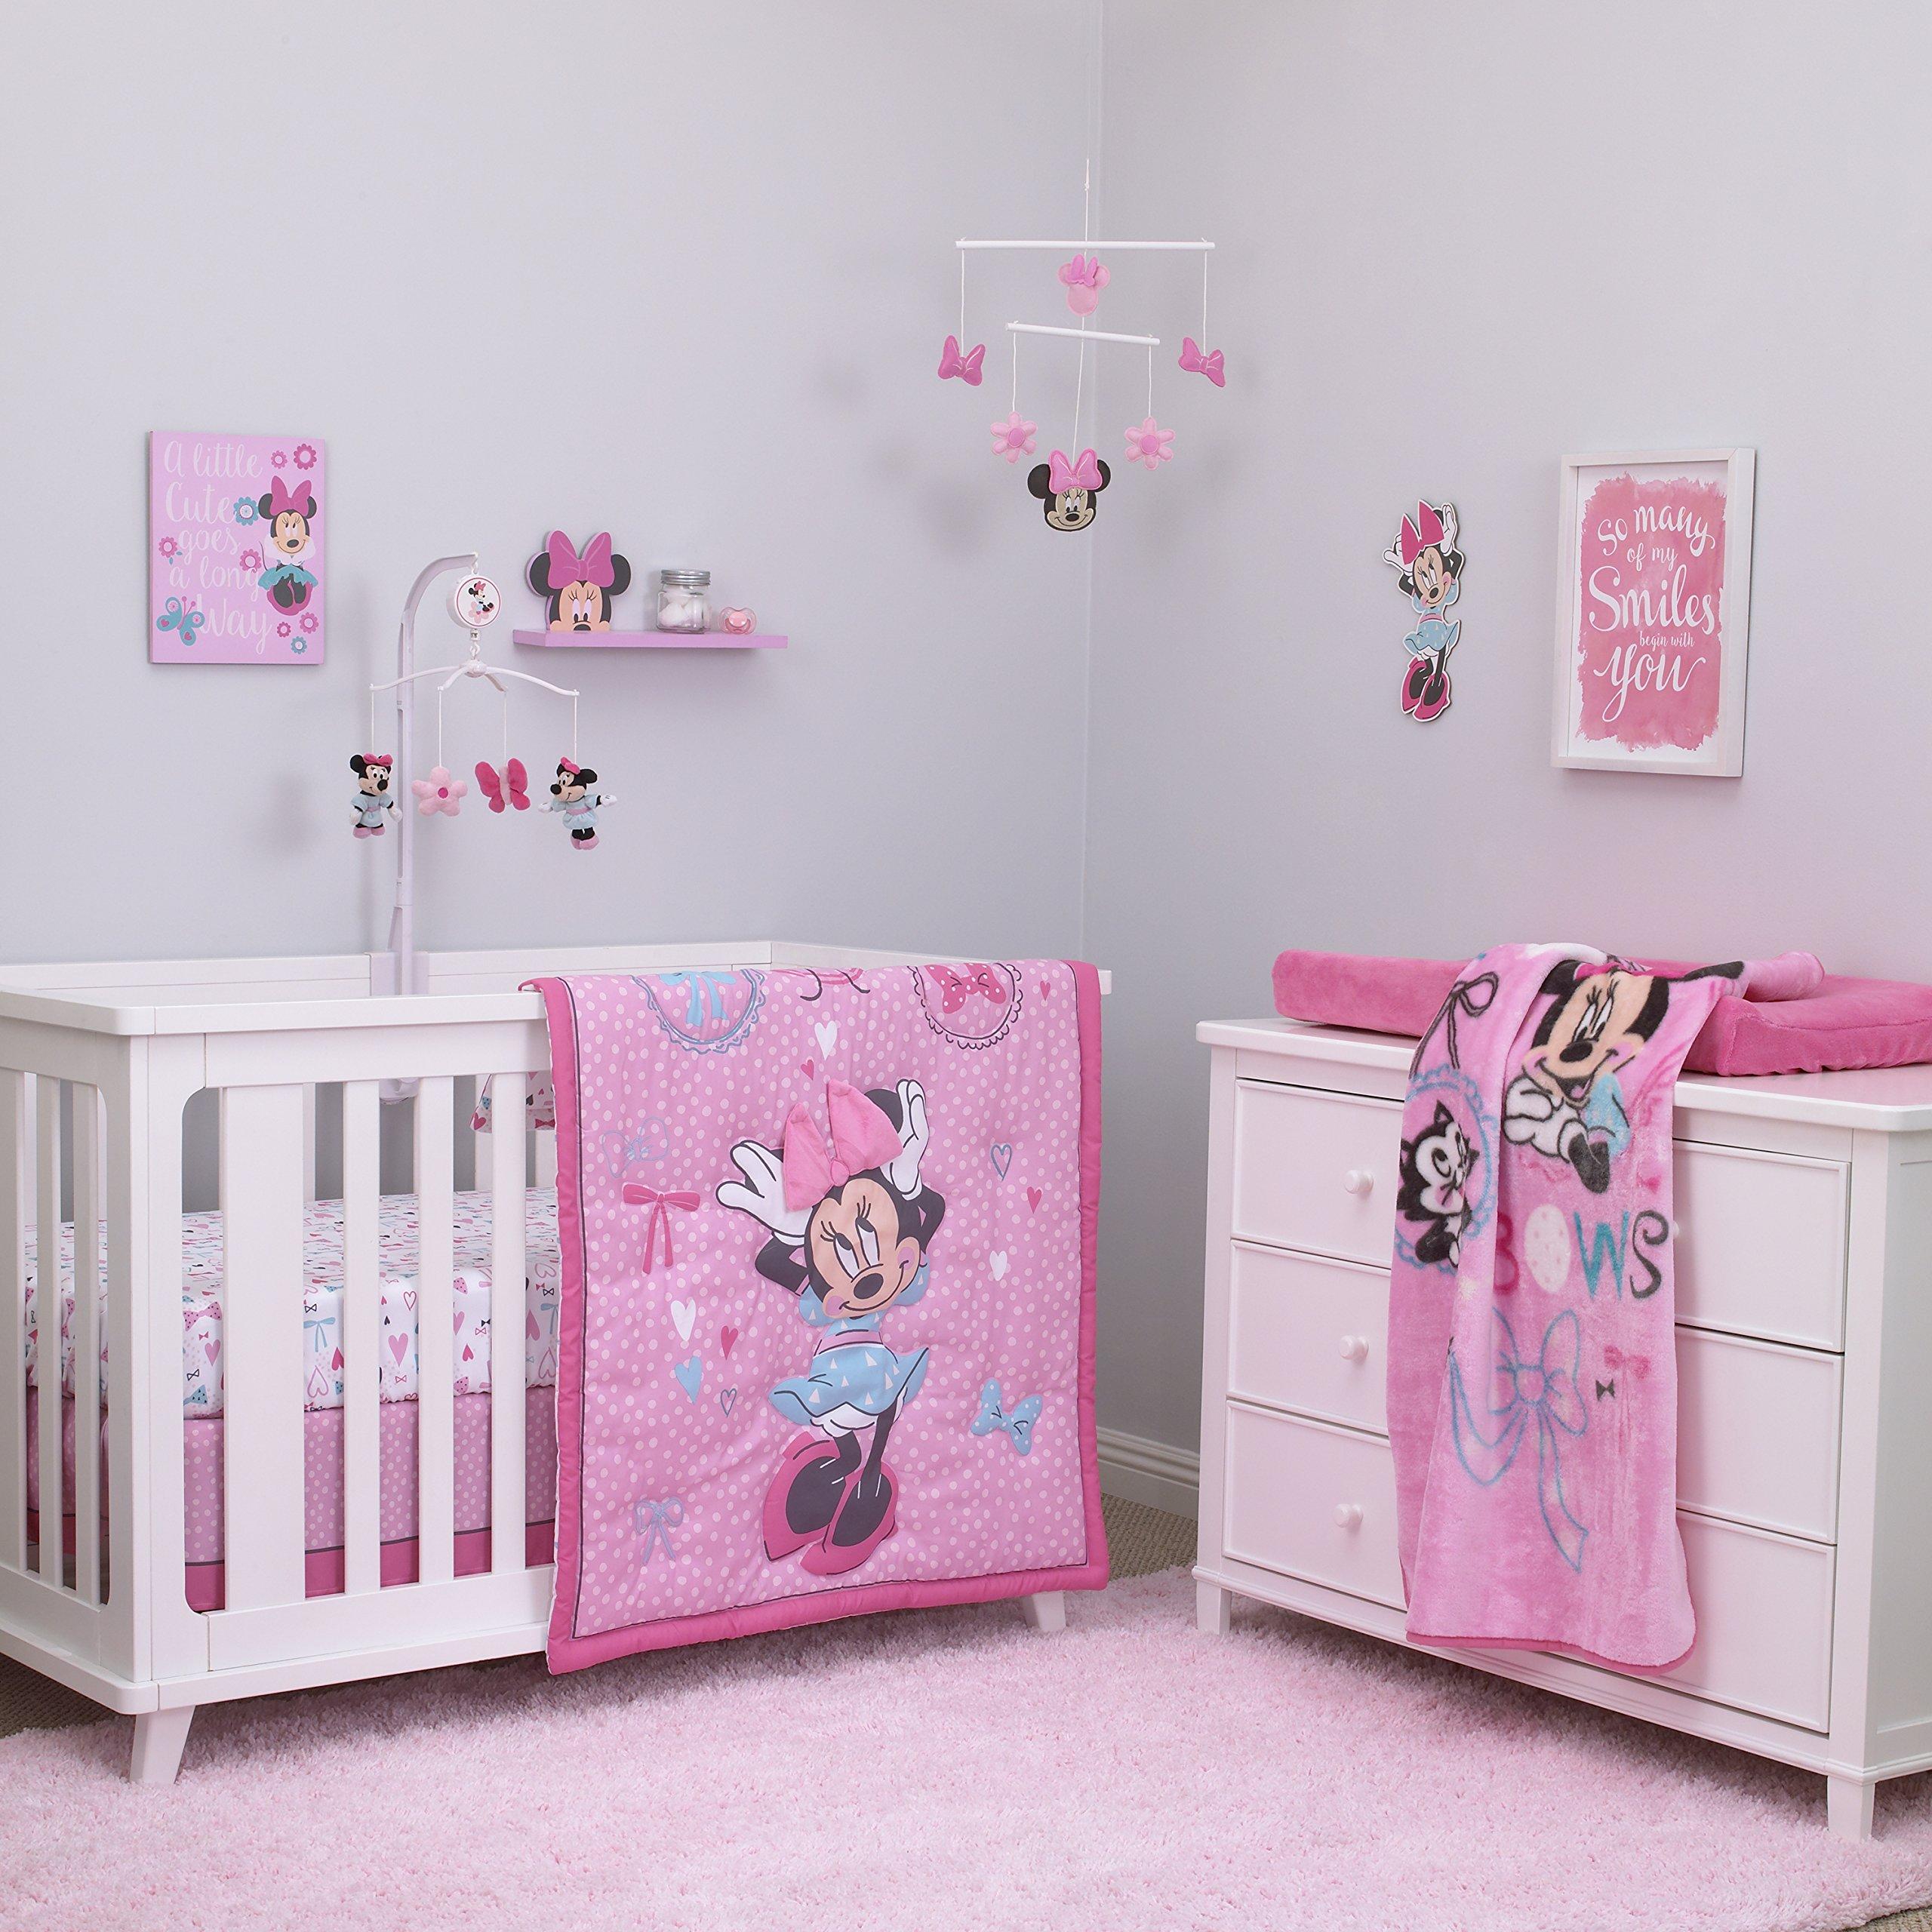 Disney Baby Minnie Mouse All About Bows 4 Piece Nursery Crib Bedding Set, Pink, Aqua by Disney